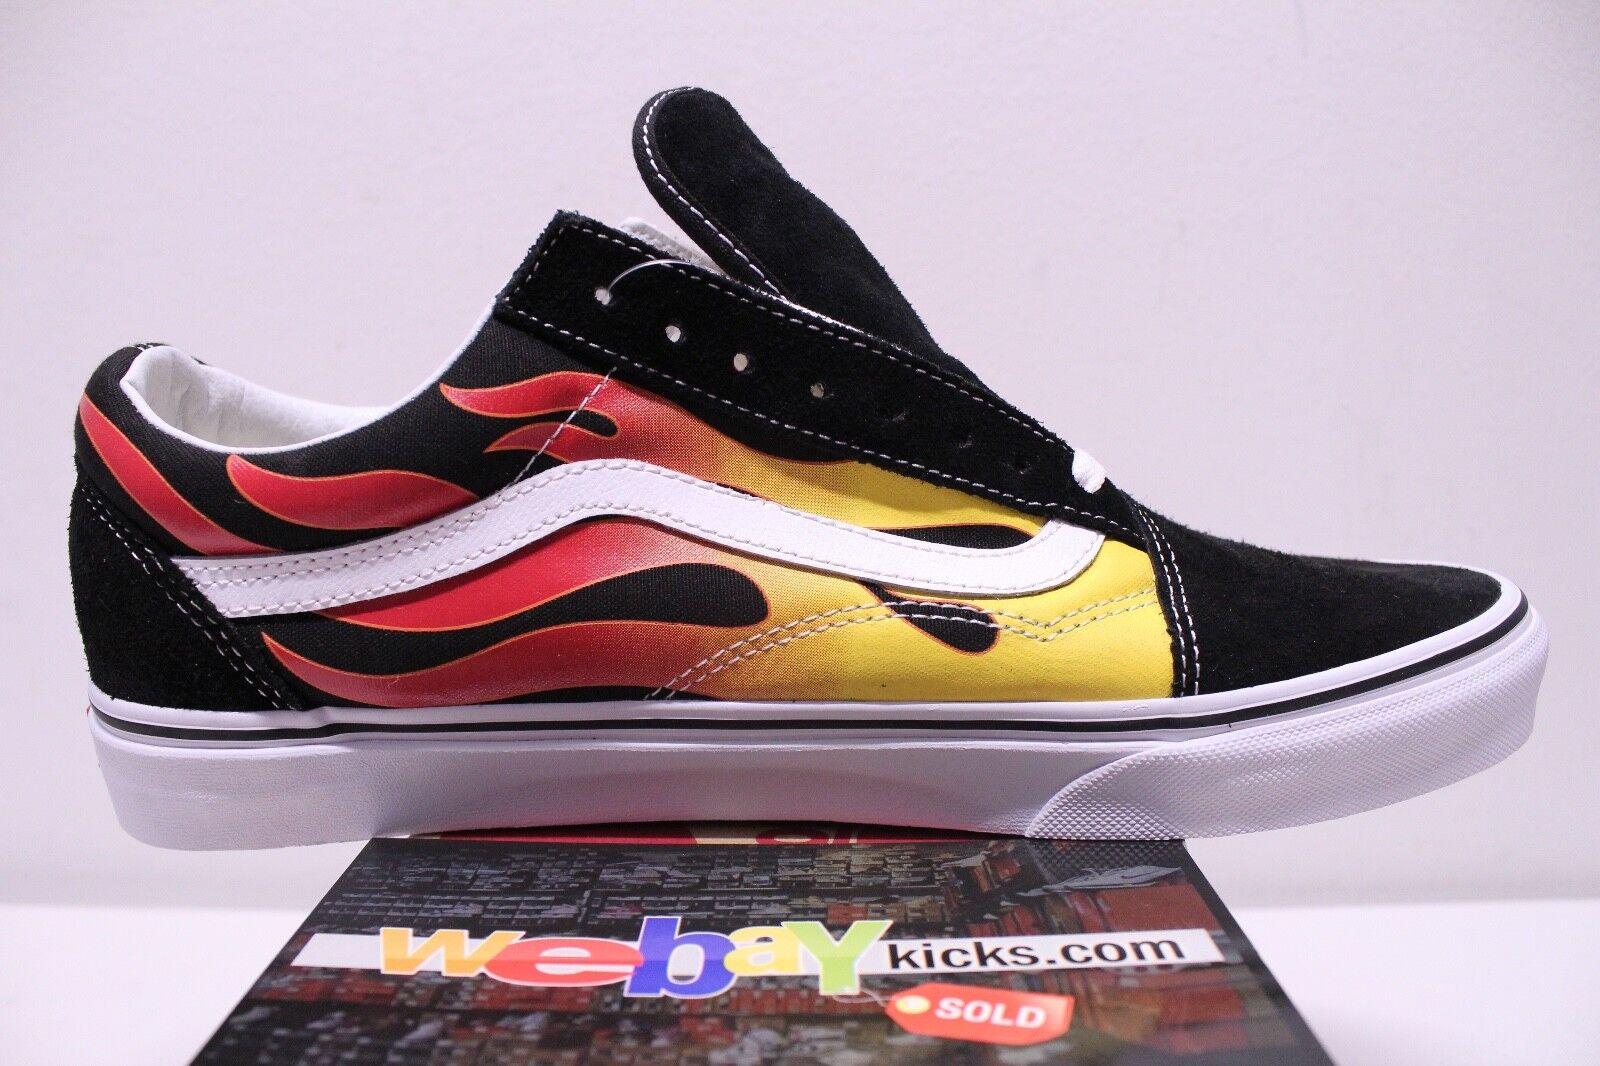 Vans Old Old Old Skool Flames nero rosso bianca scarpe da ginnastica Uomo Dimensione 12 Brand New 2a51cf